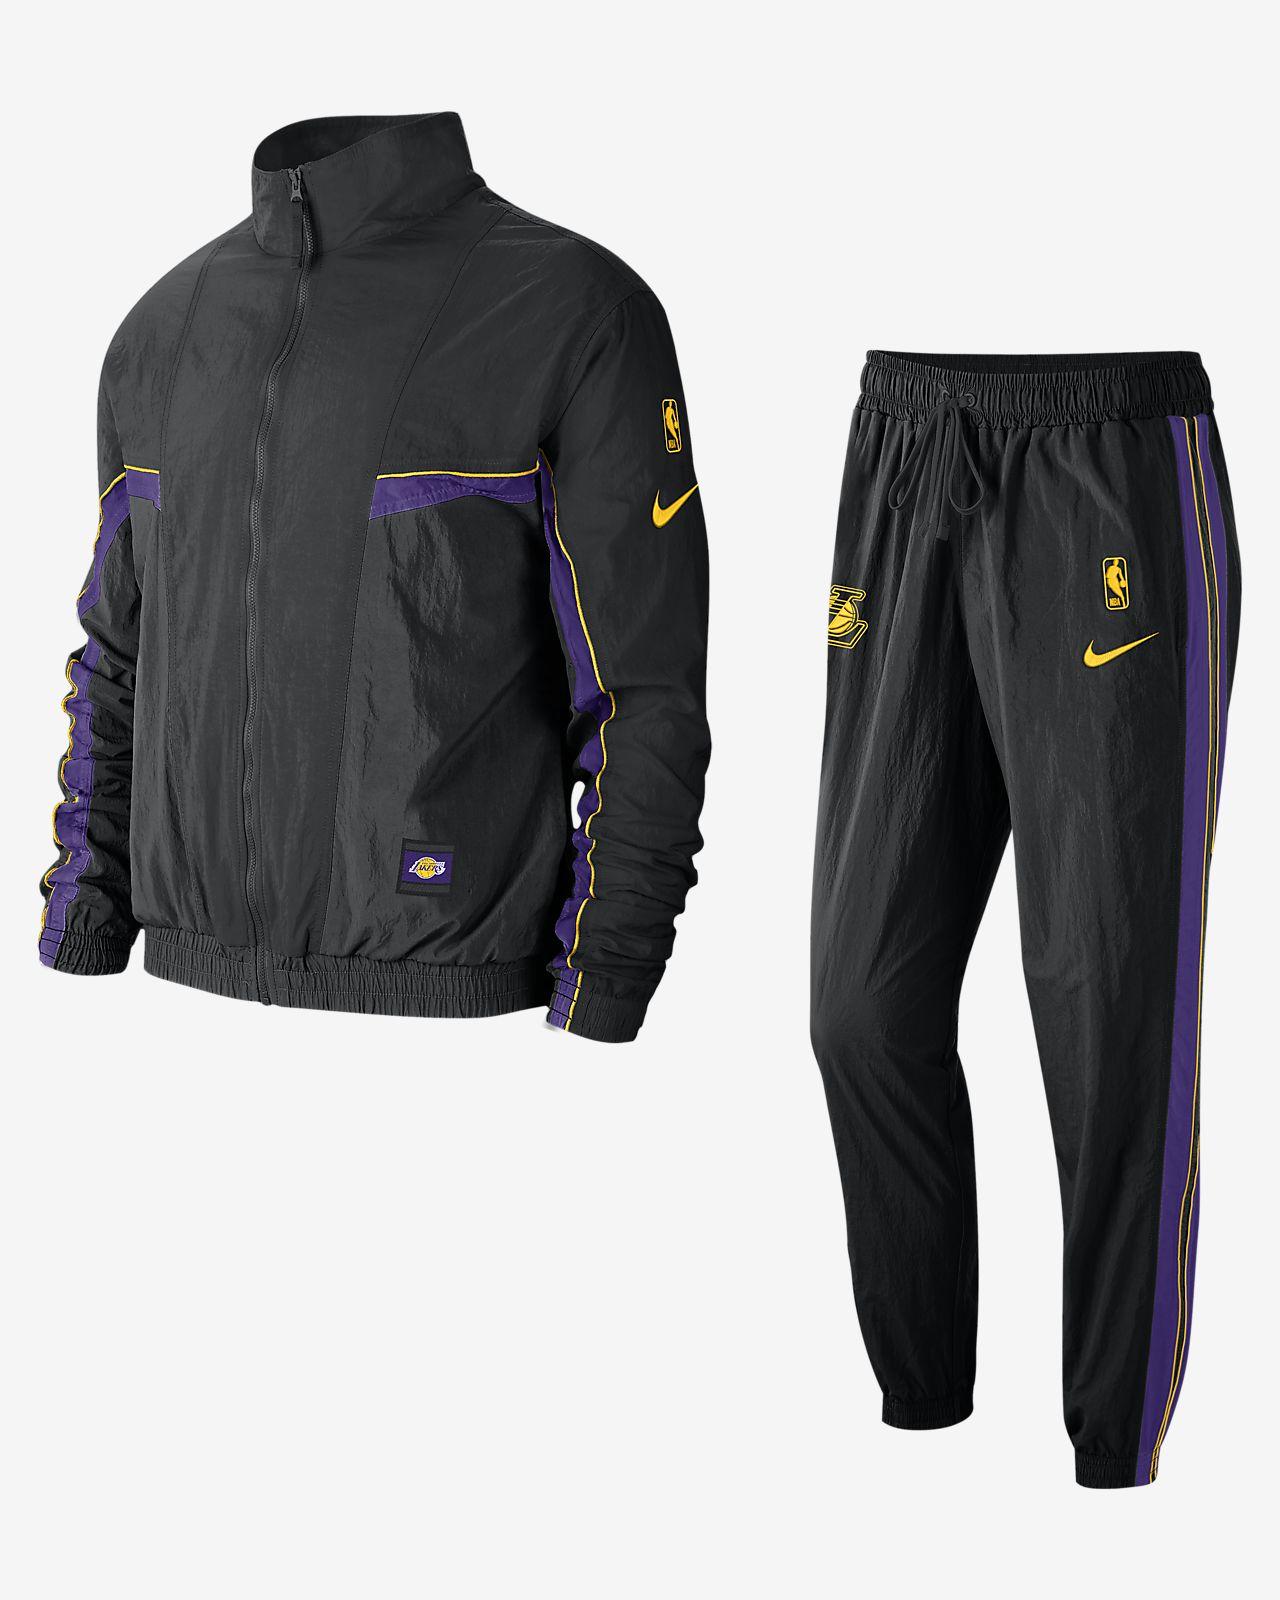 Los Angeles Lakers Nike NBA-Trainingsanzug für Herren